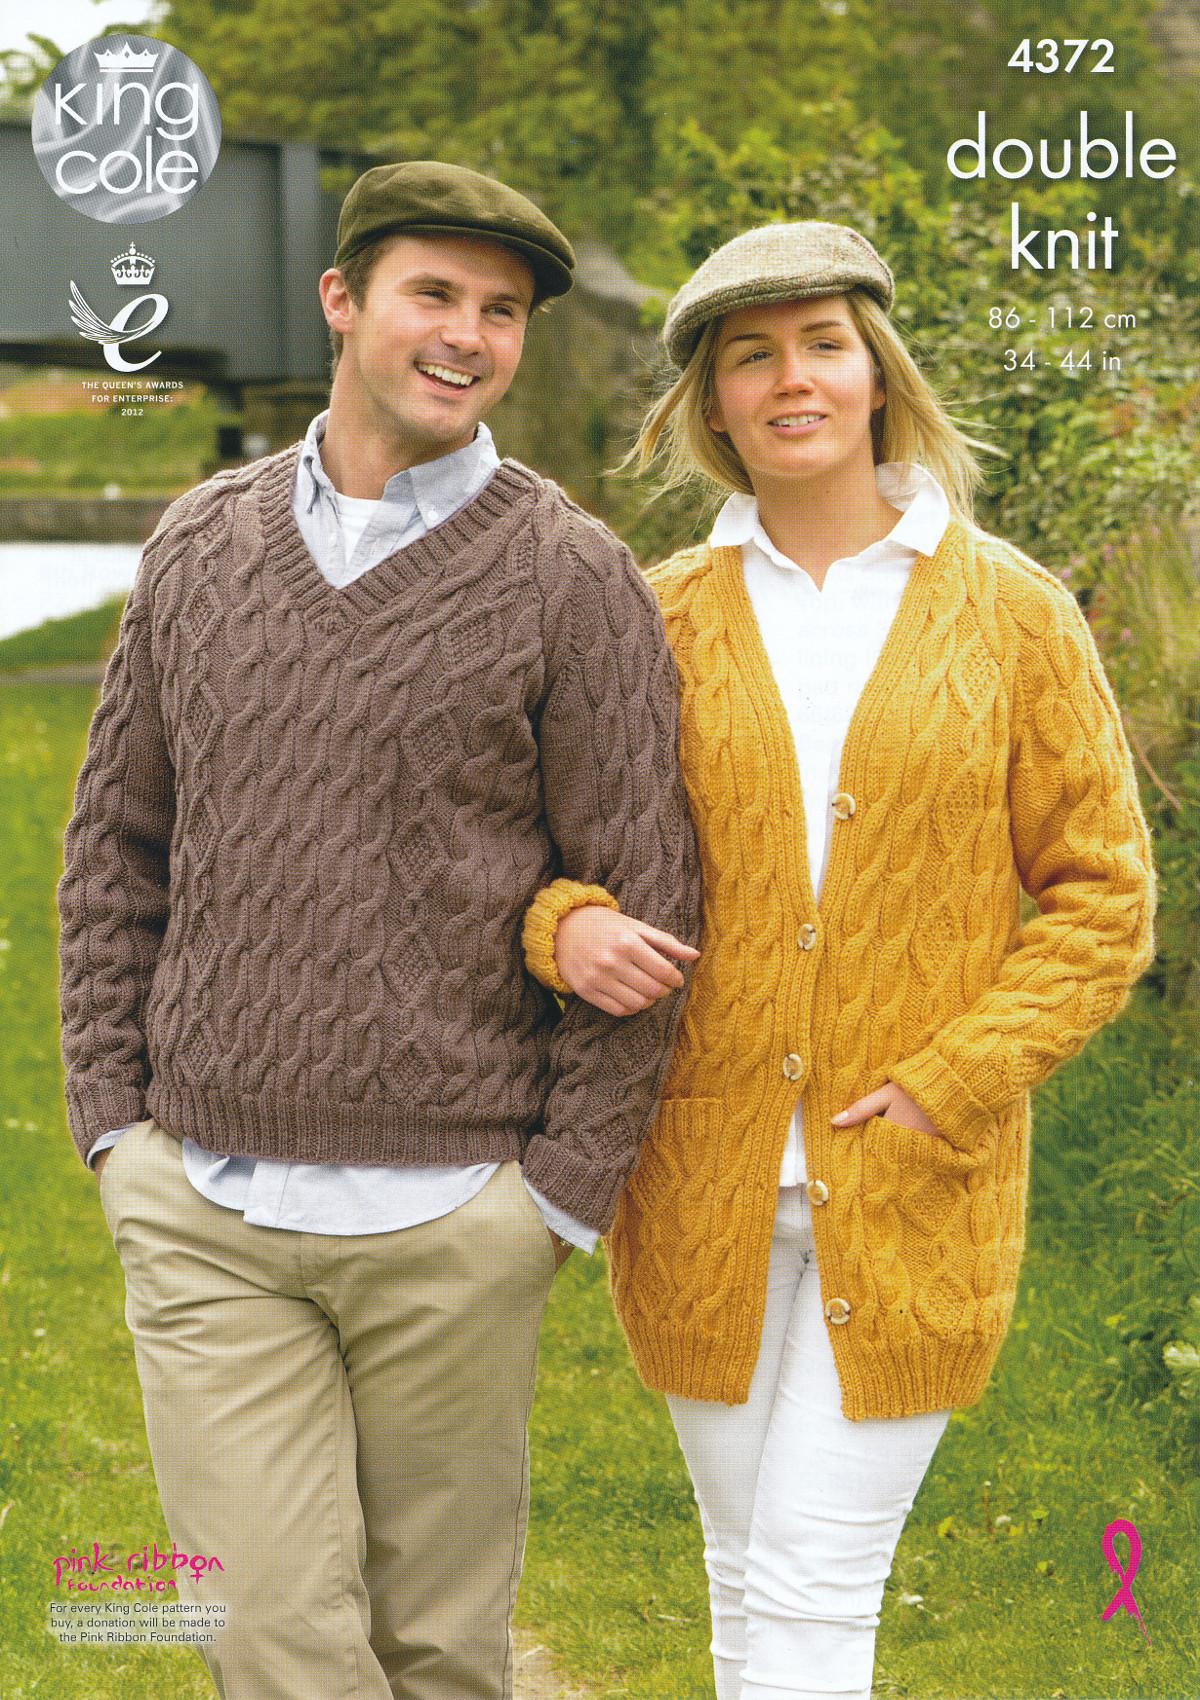 King Cole Knitting Pattern 3318 : King Cole Ladies Mens Double Knitting Pattern Cable Knit Jumper Cardigan DK 4...